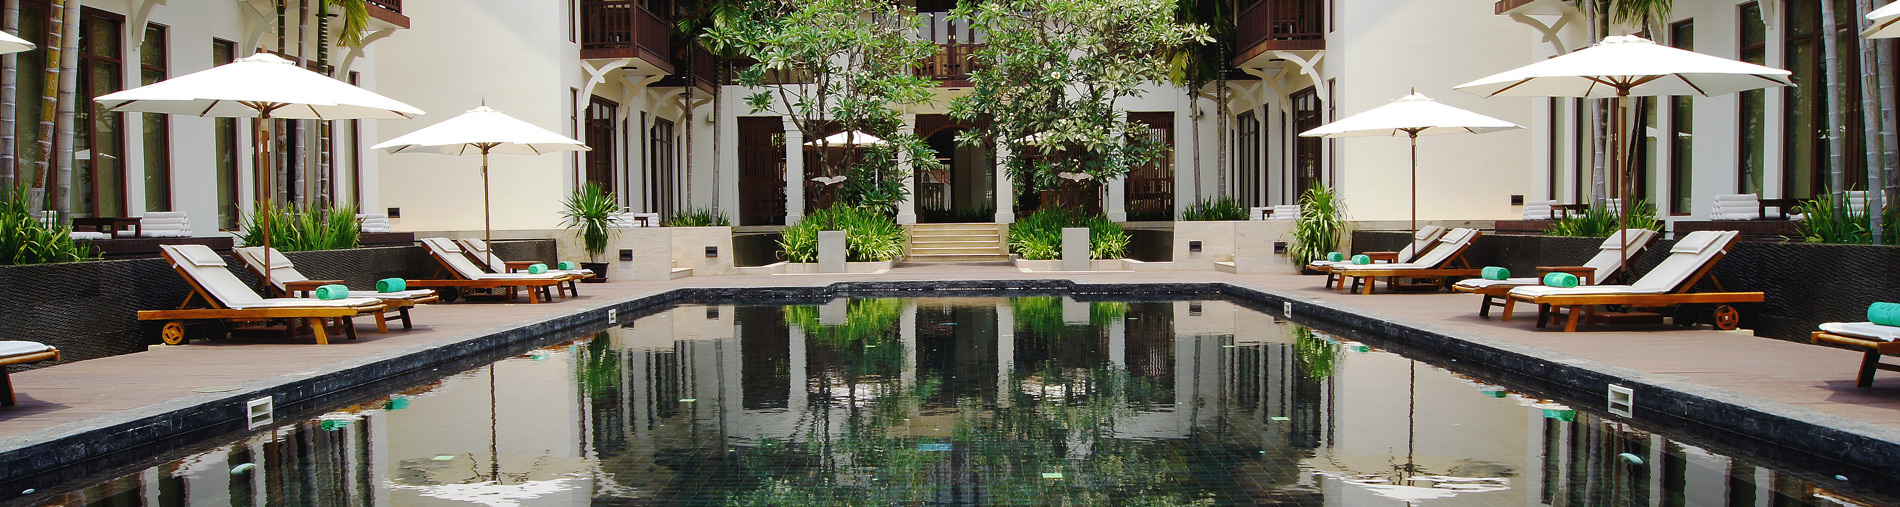 rondreis cambodja hotels